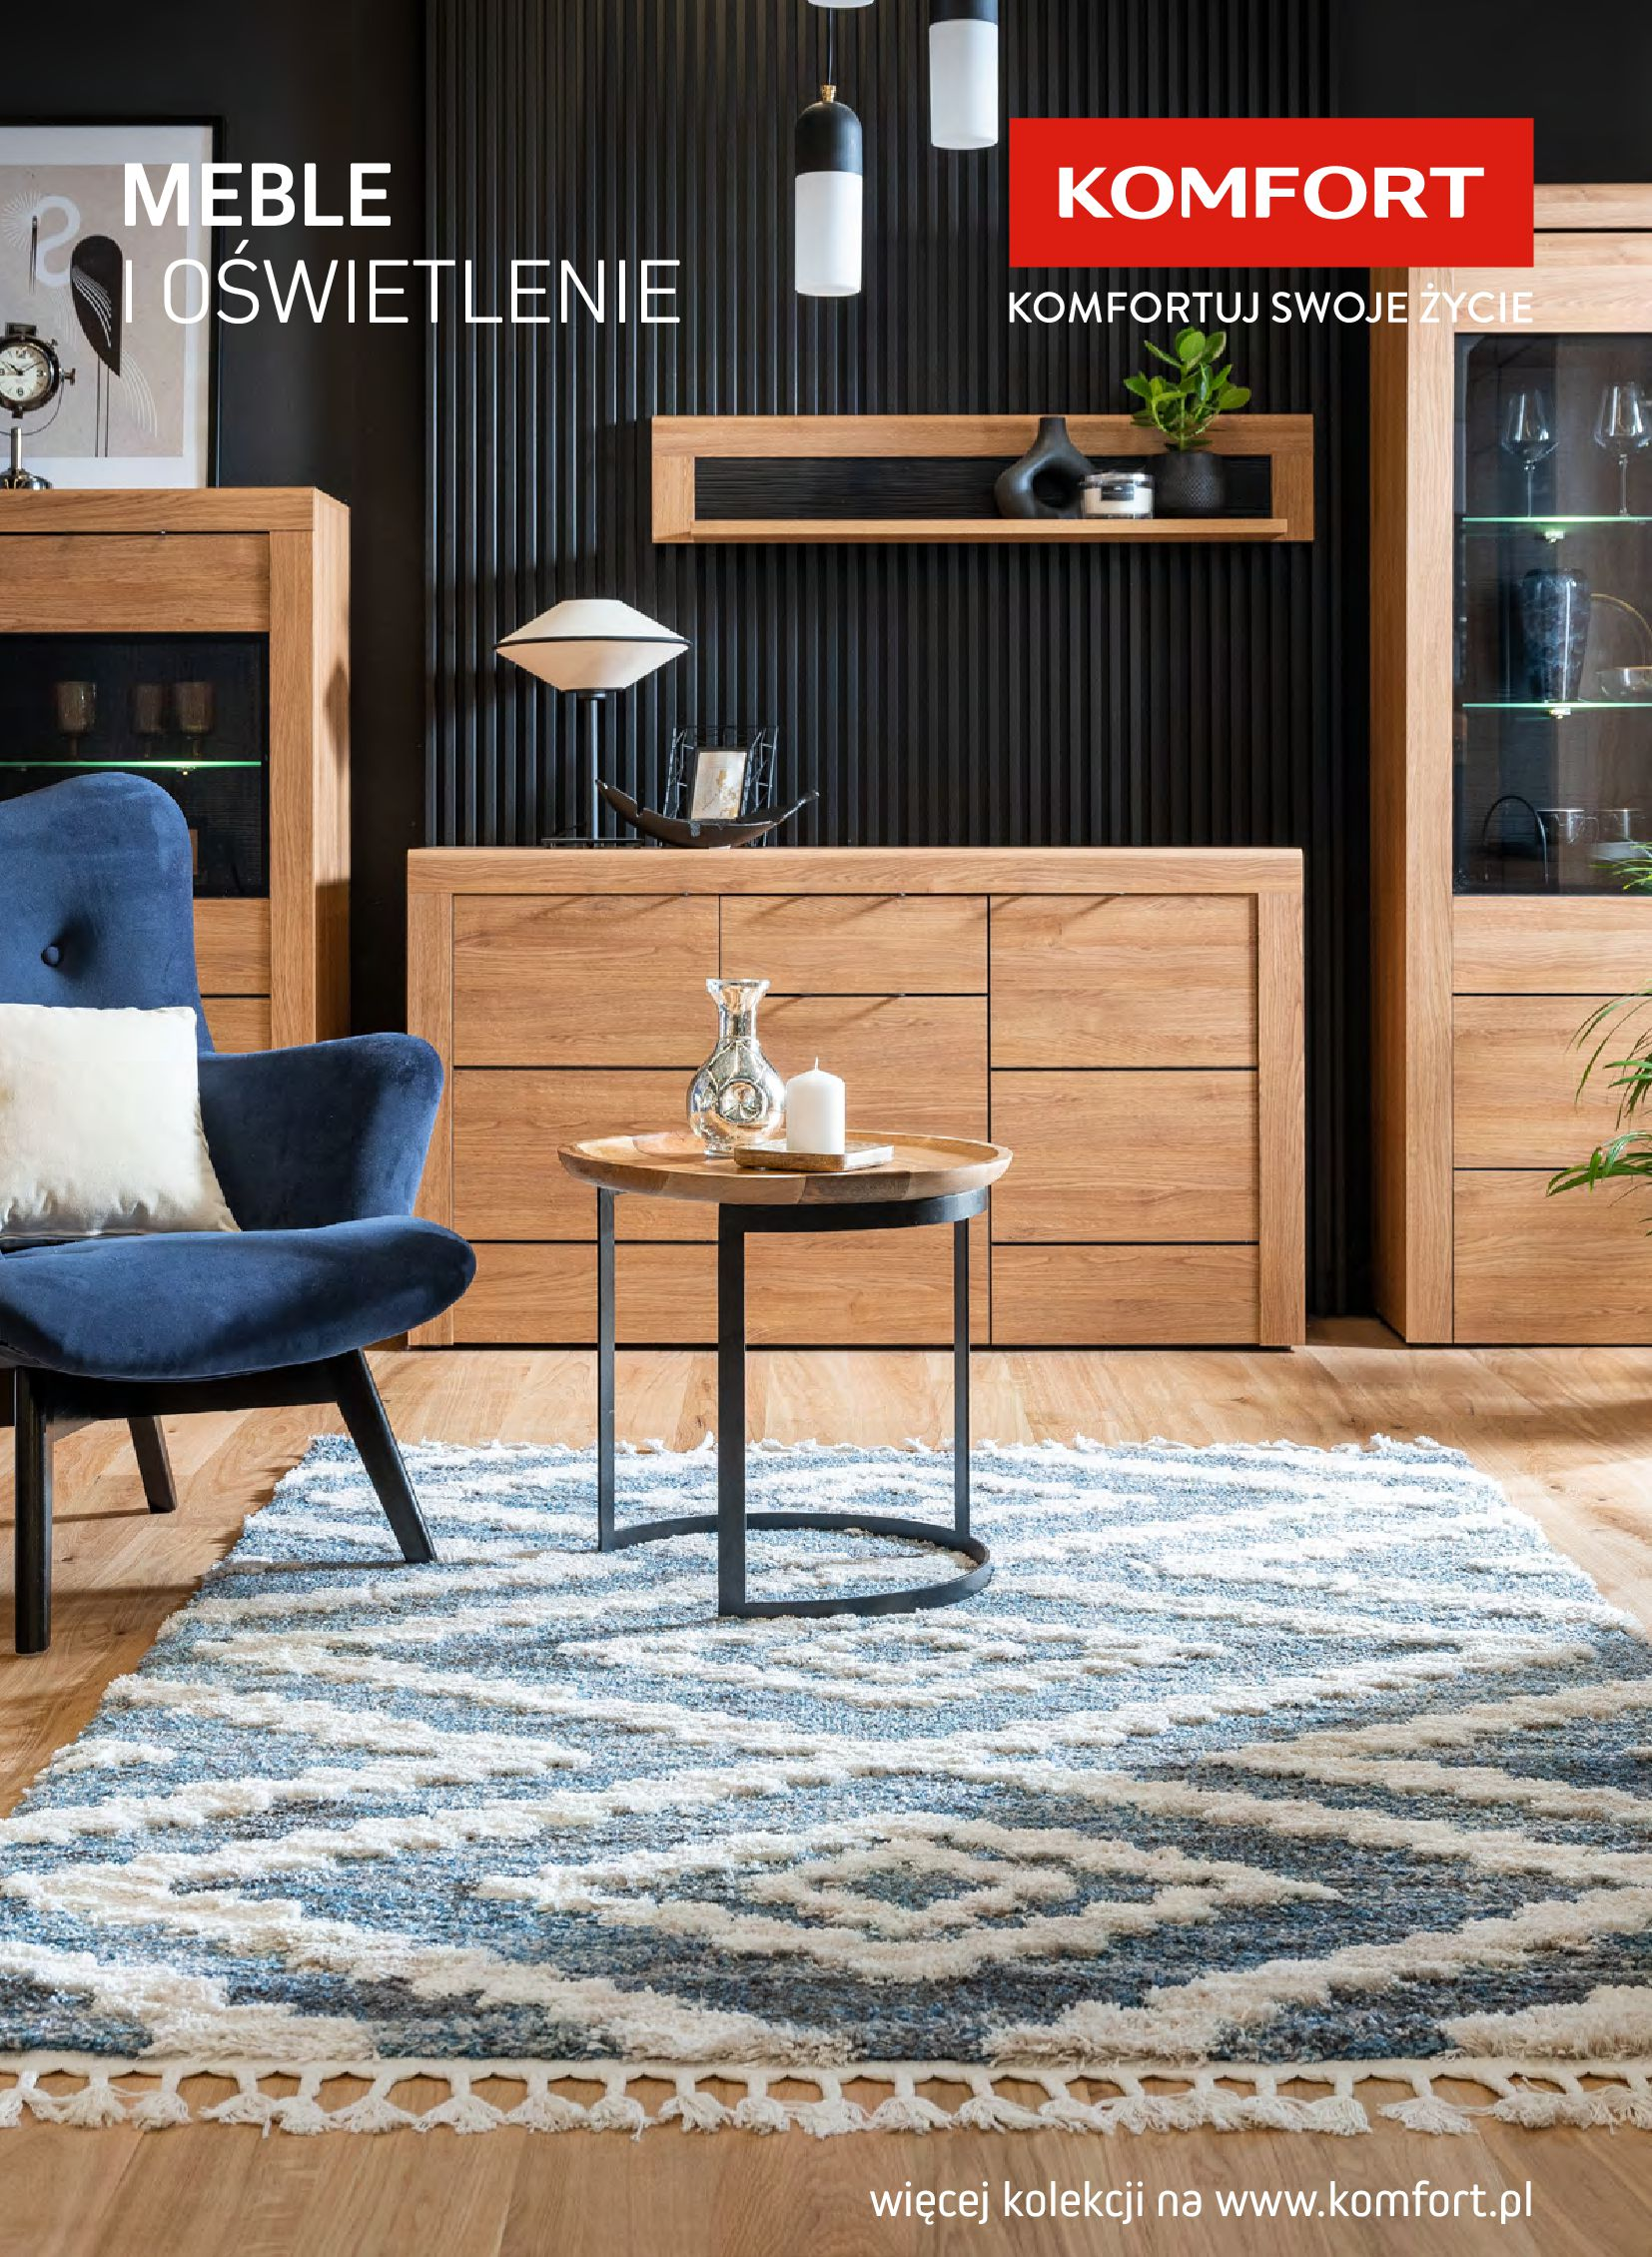 Komfort:  Gazetka komfort - Meble i oświetlenie 25.08.2021